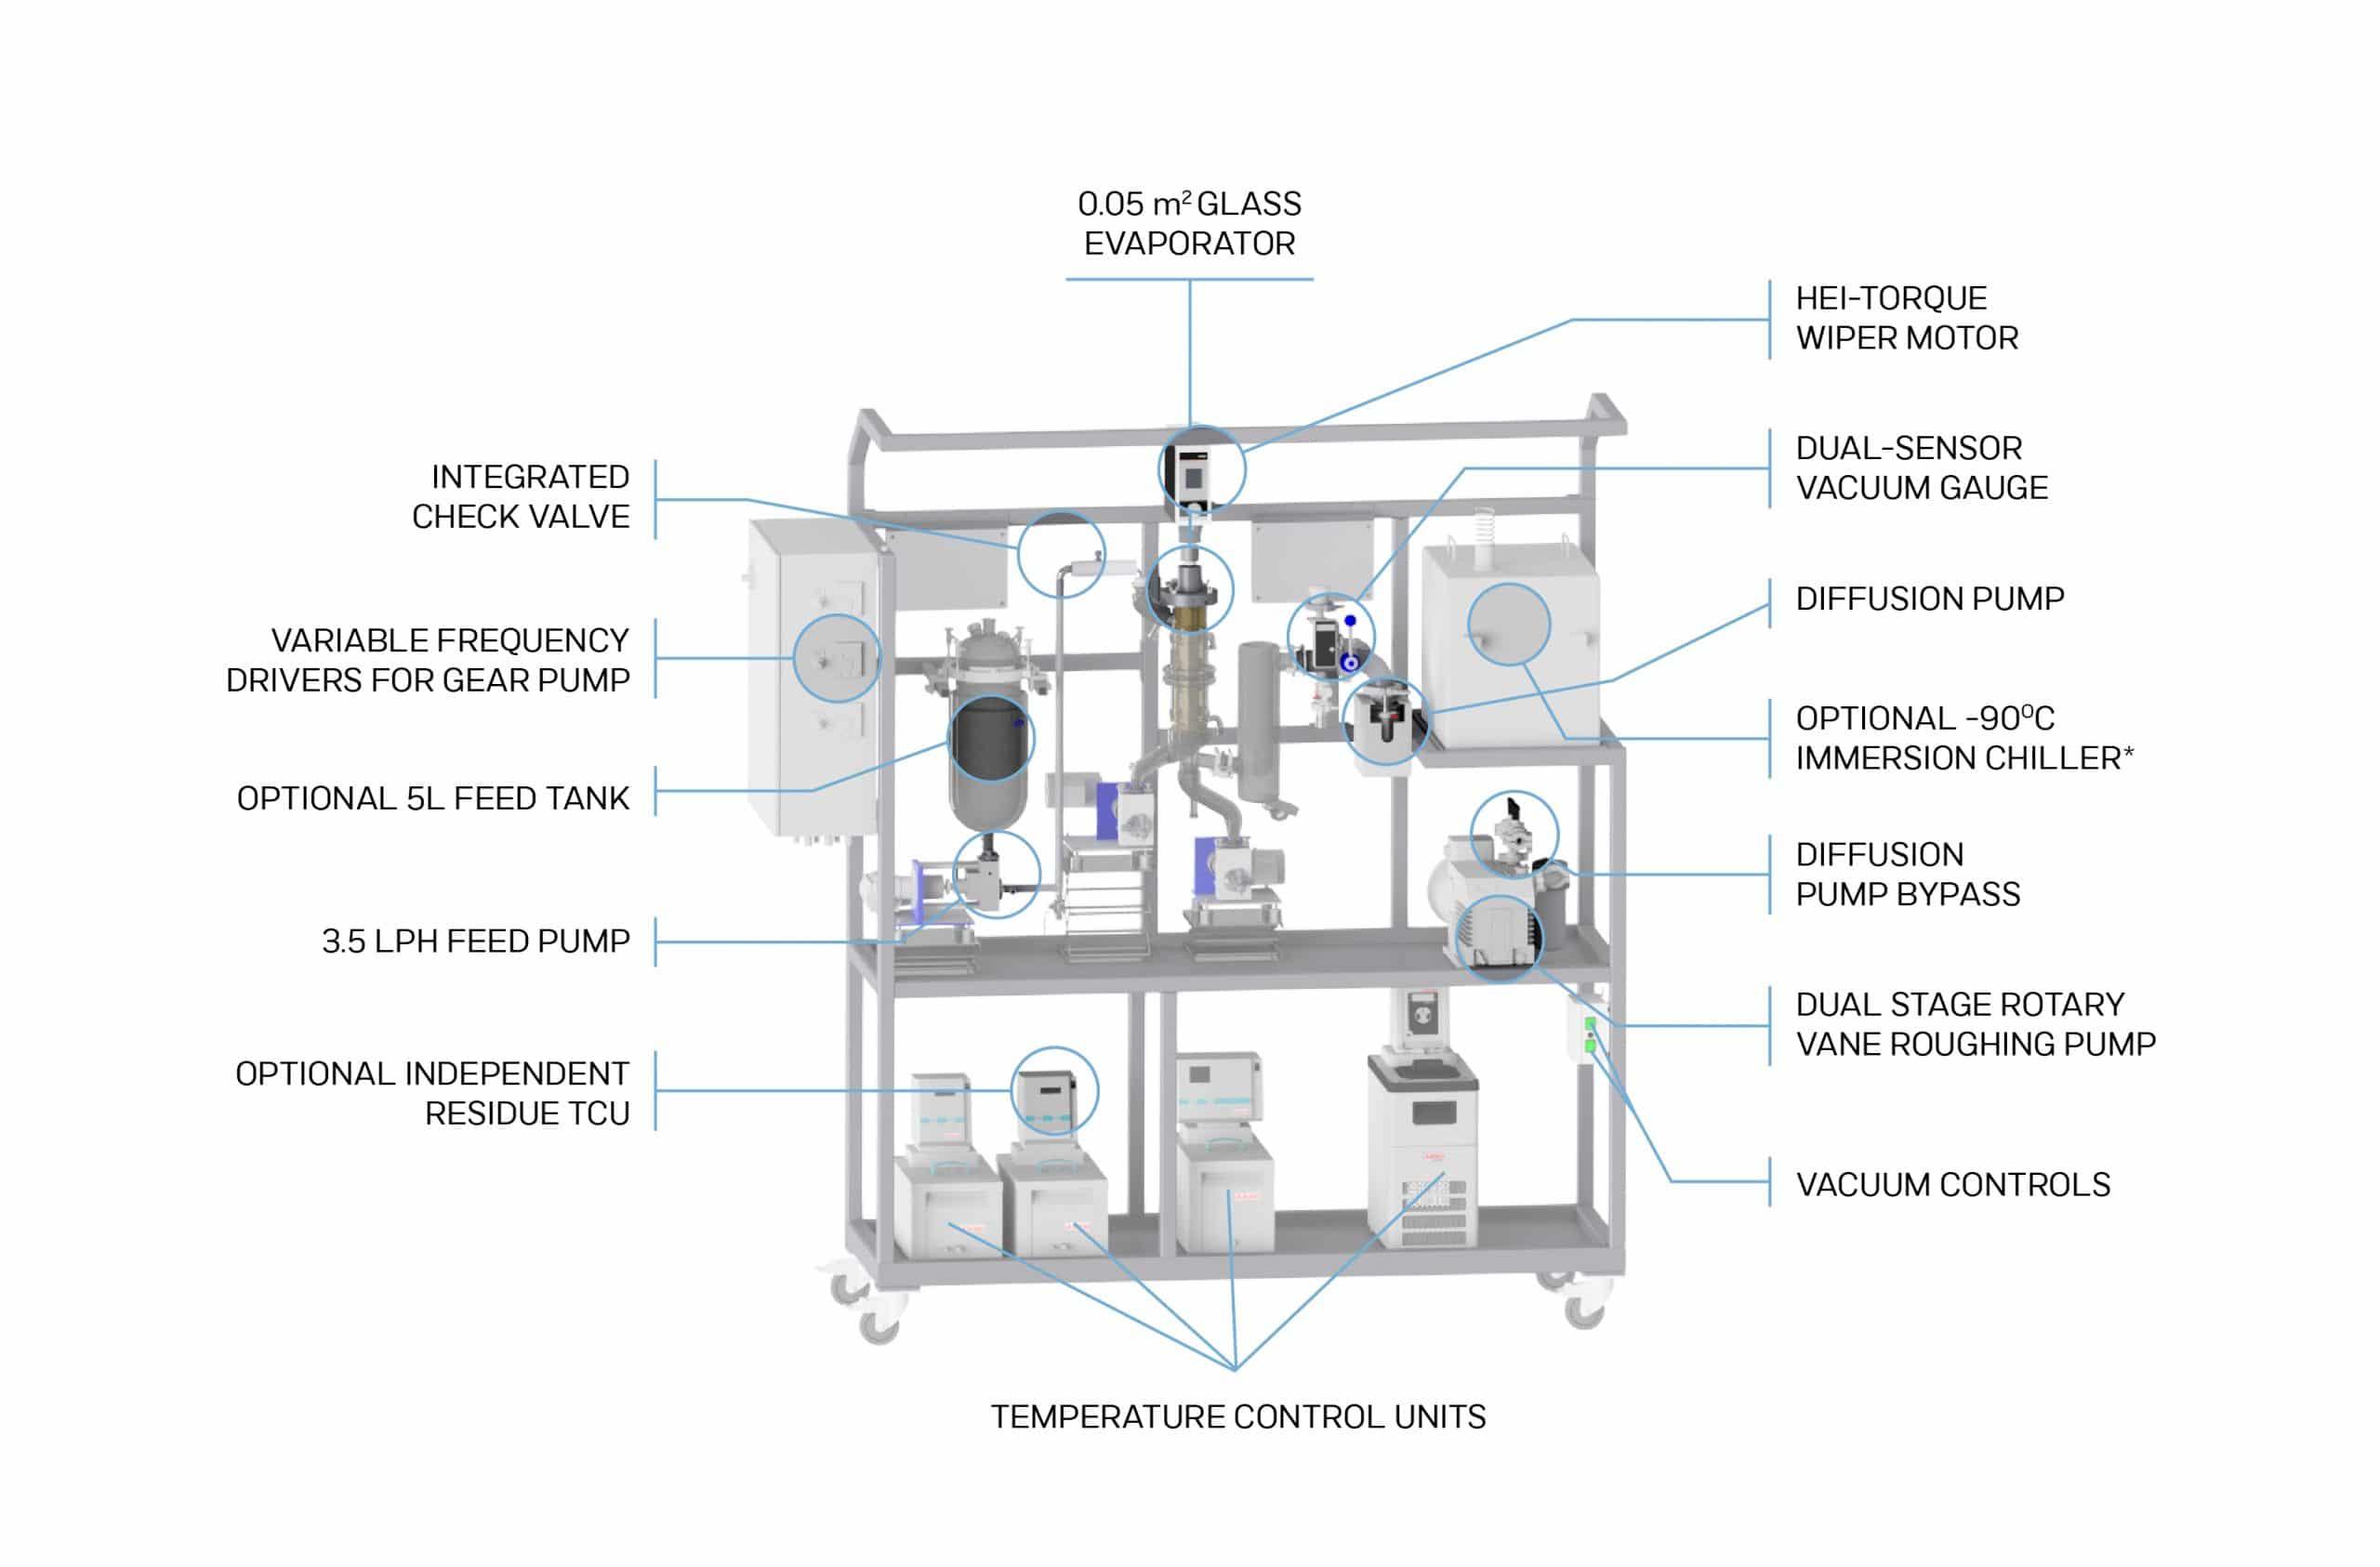 VKL 75 cannabis distillation equipment